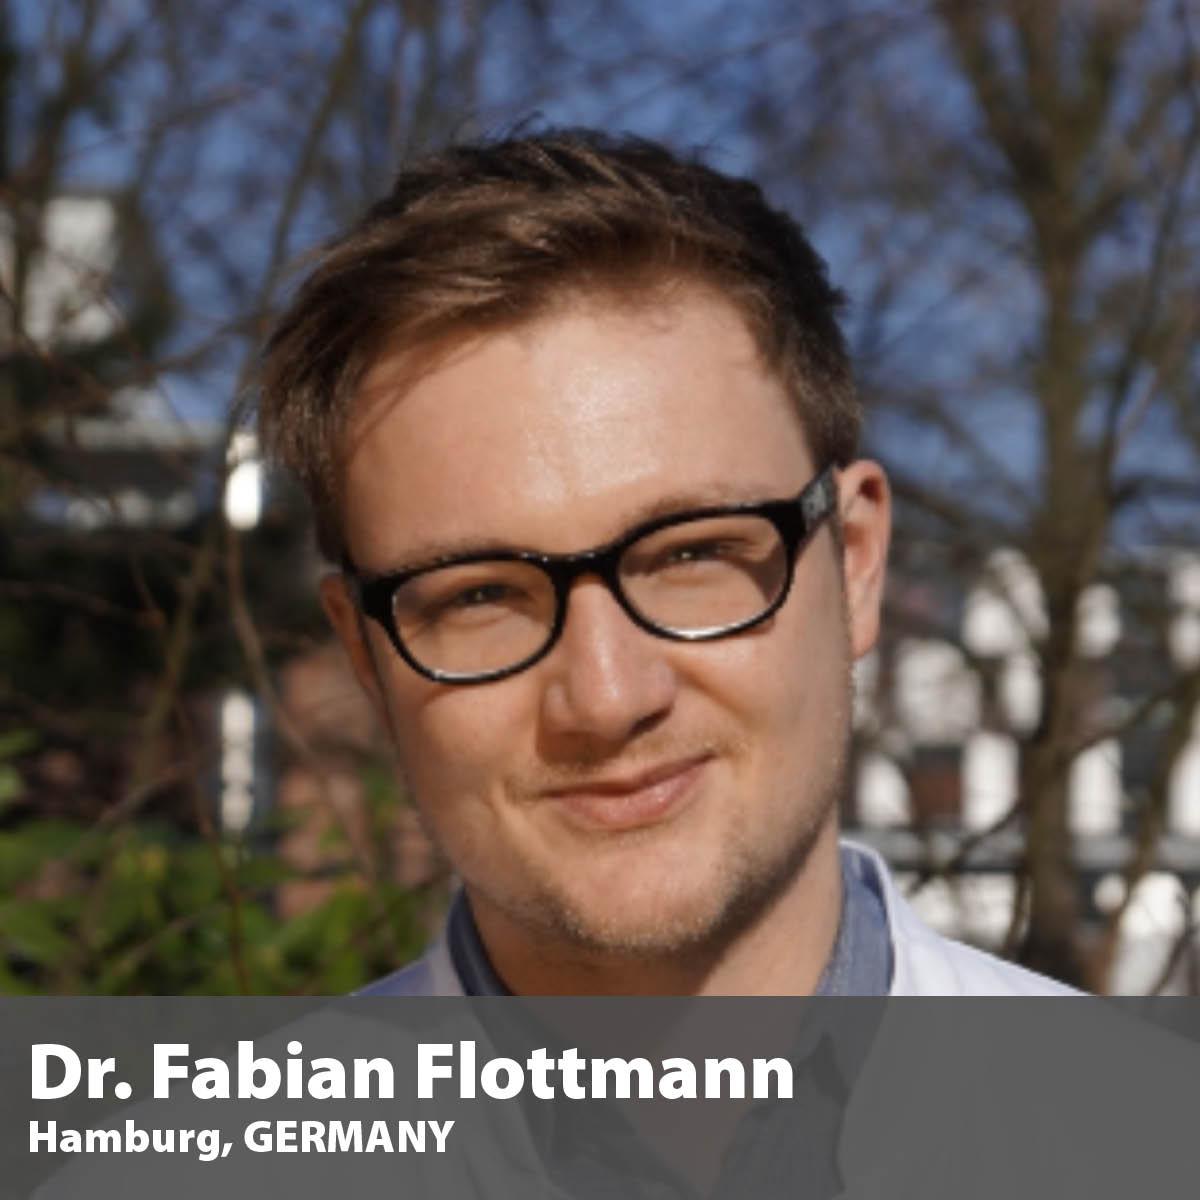 Dr. Fabian Flottmann